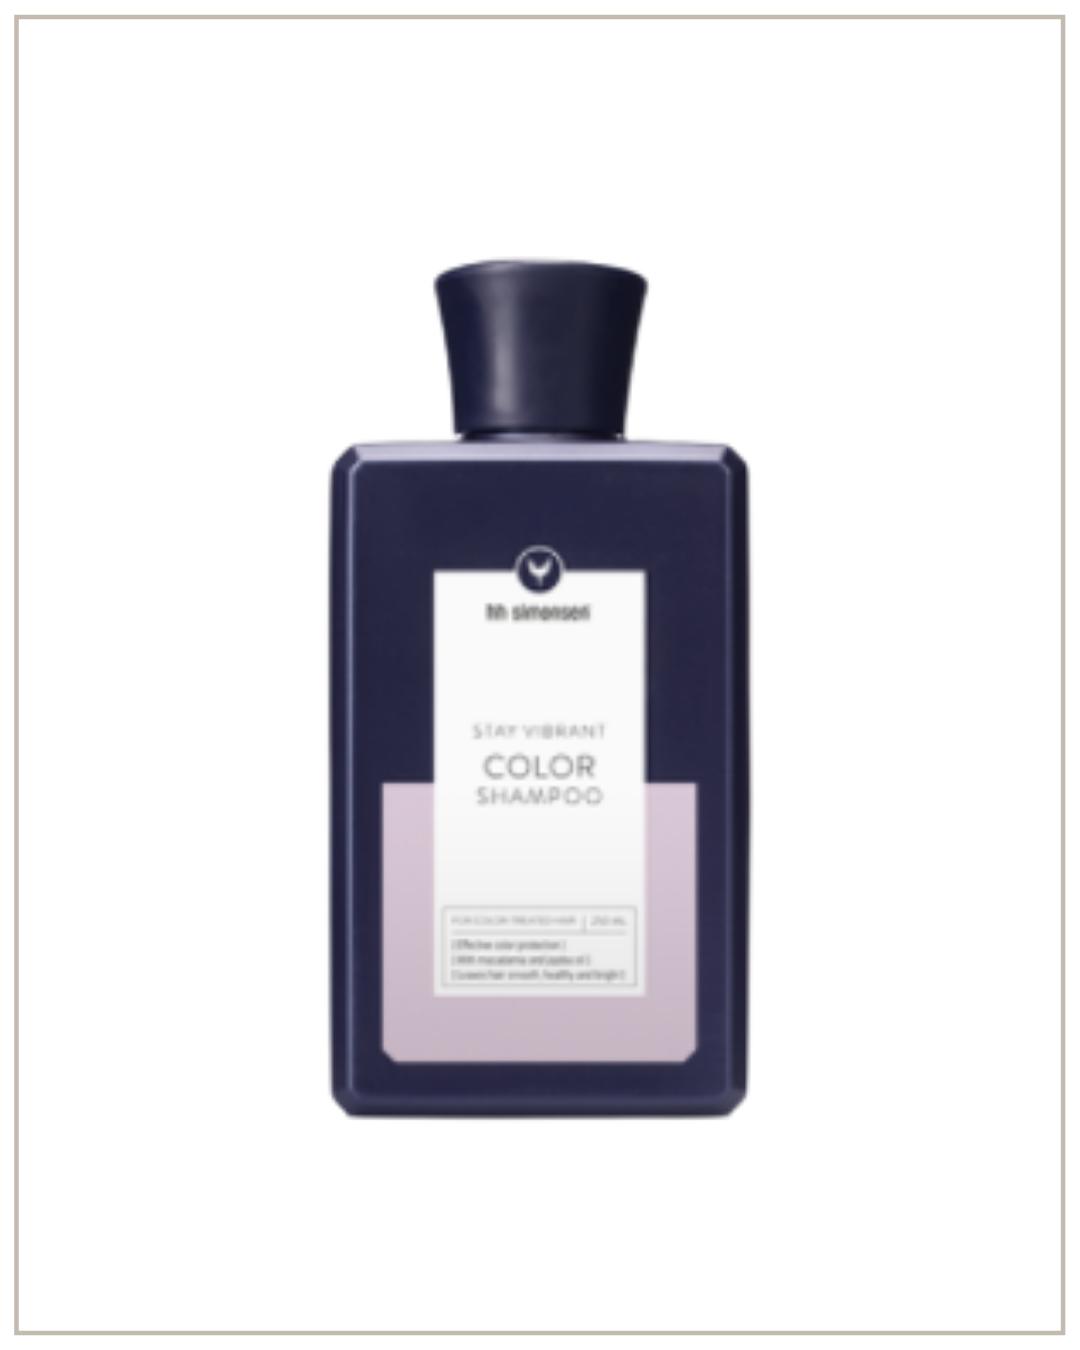 HH Simonsen COLOR šampūnas dažytiems plaukams